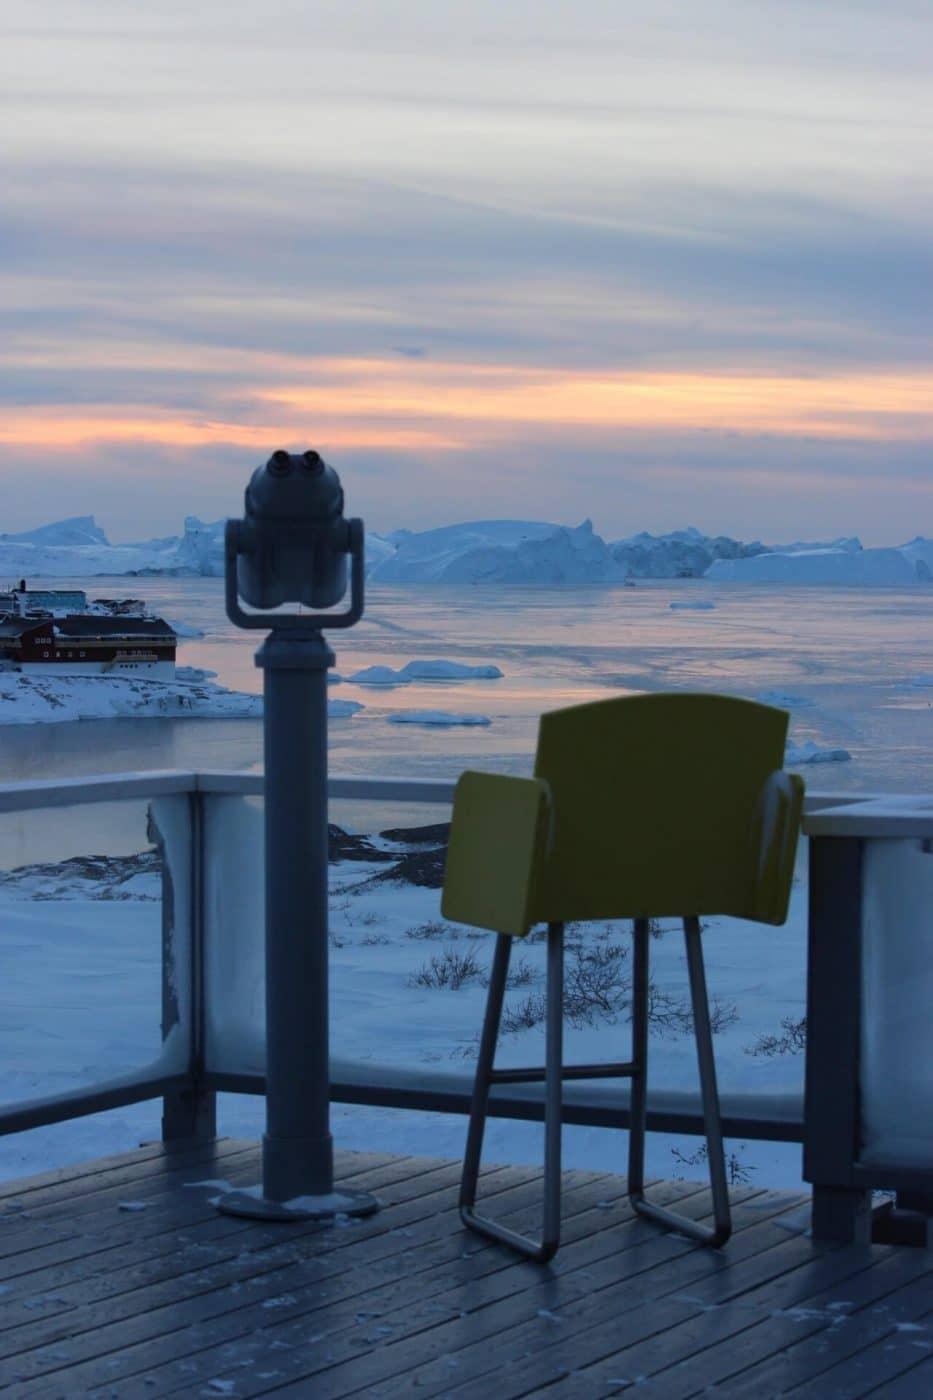 Hotel Arctic Terrace. Ilulissat. Photo by Vibha Dania-Dhawan